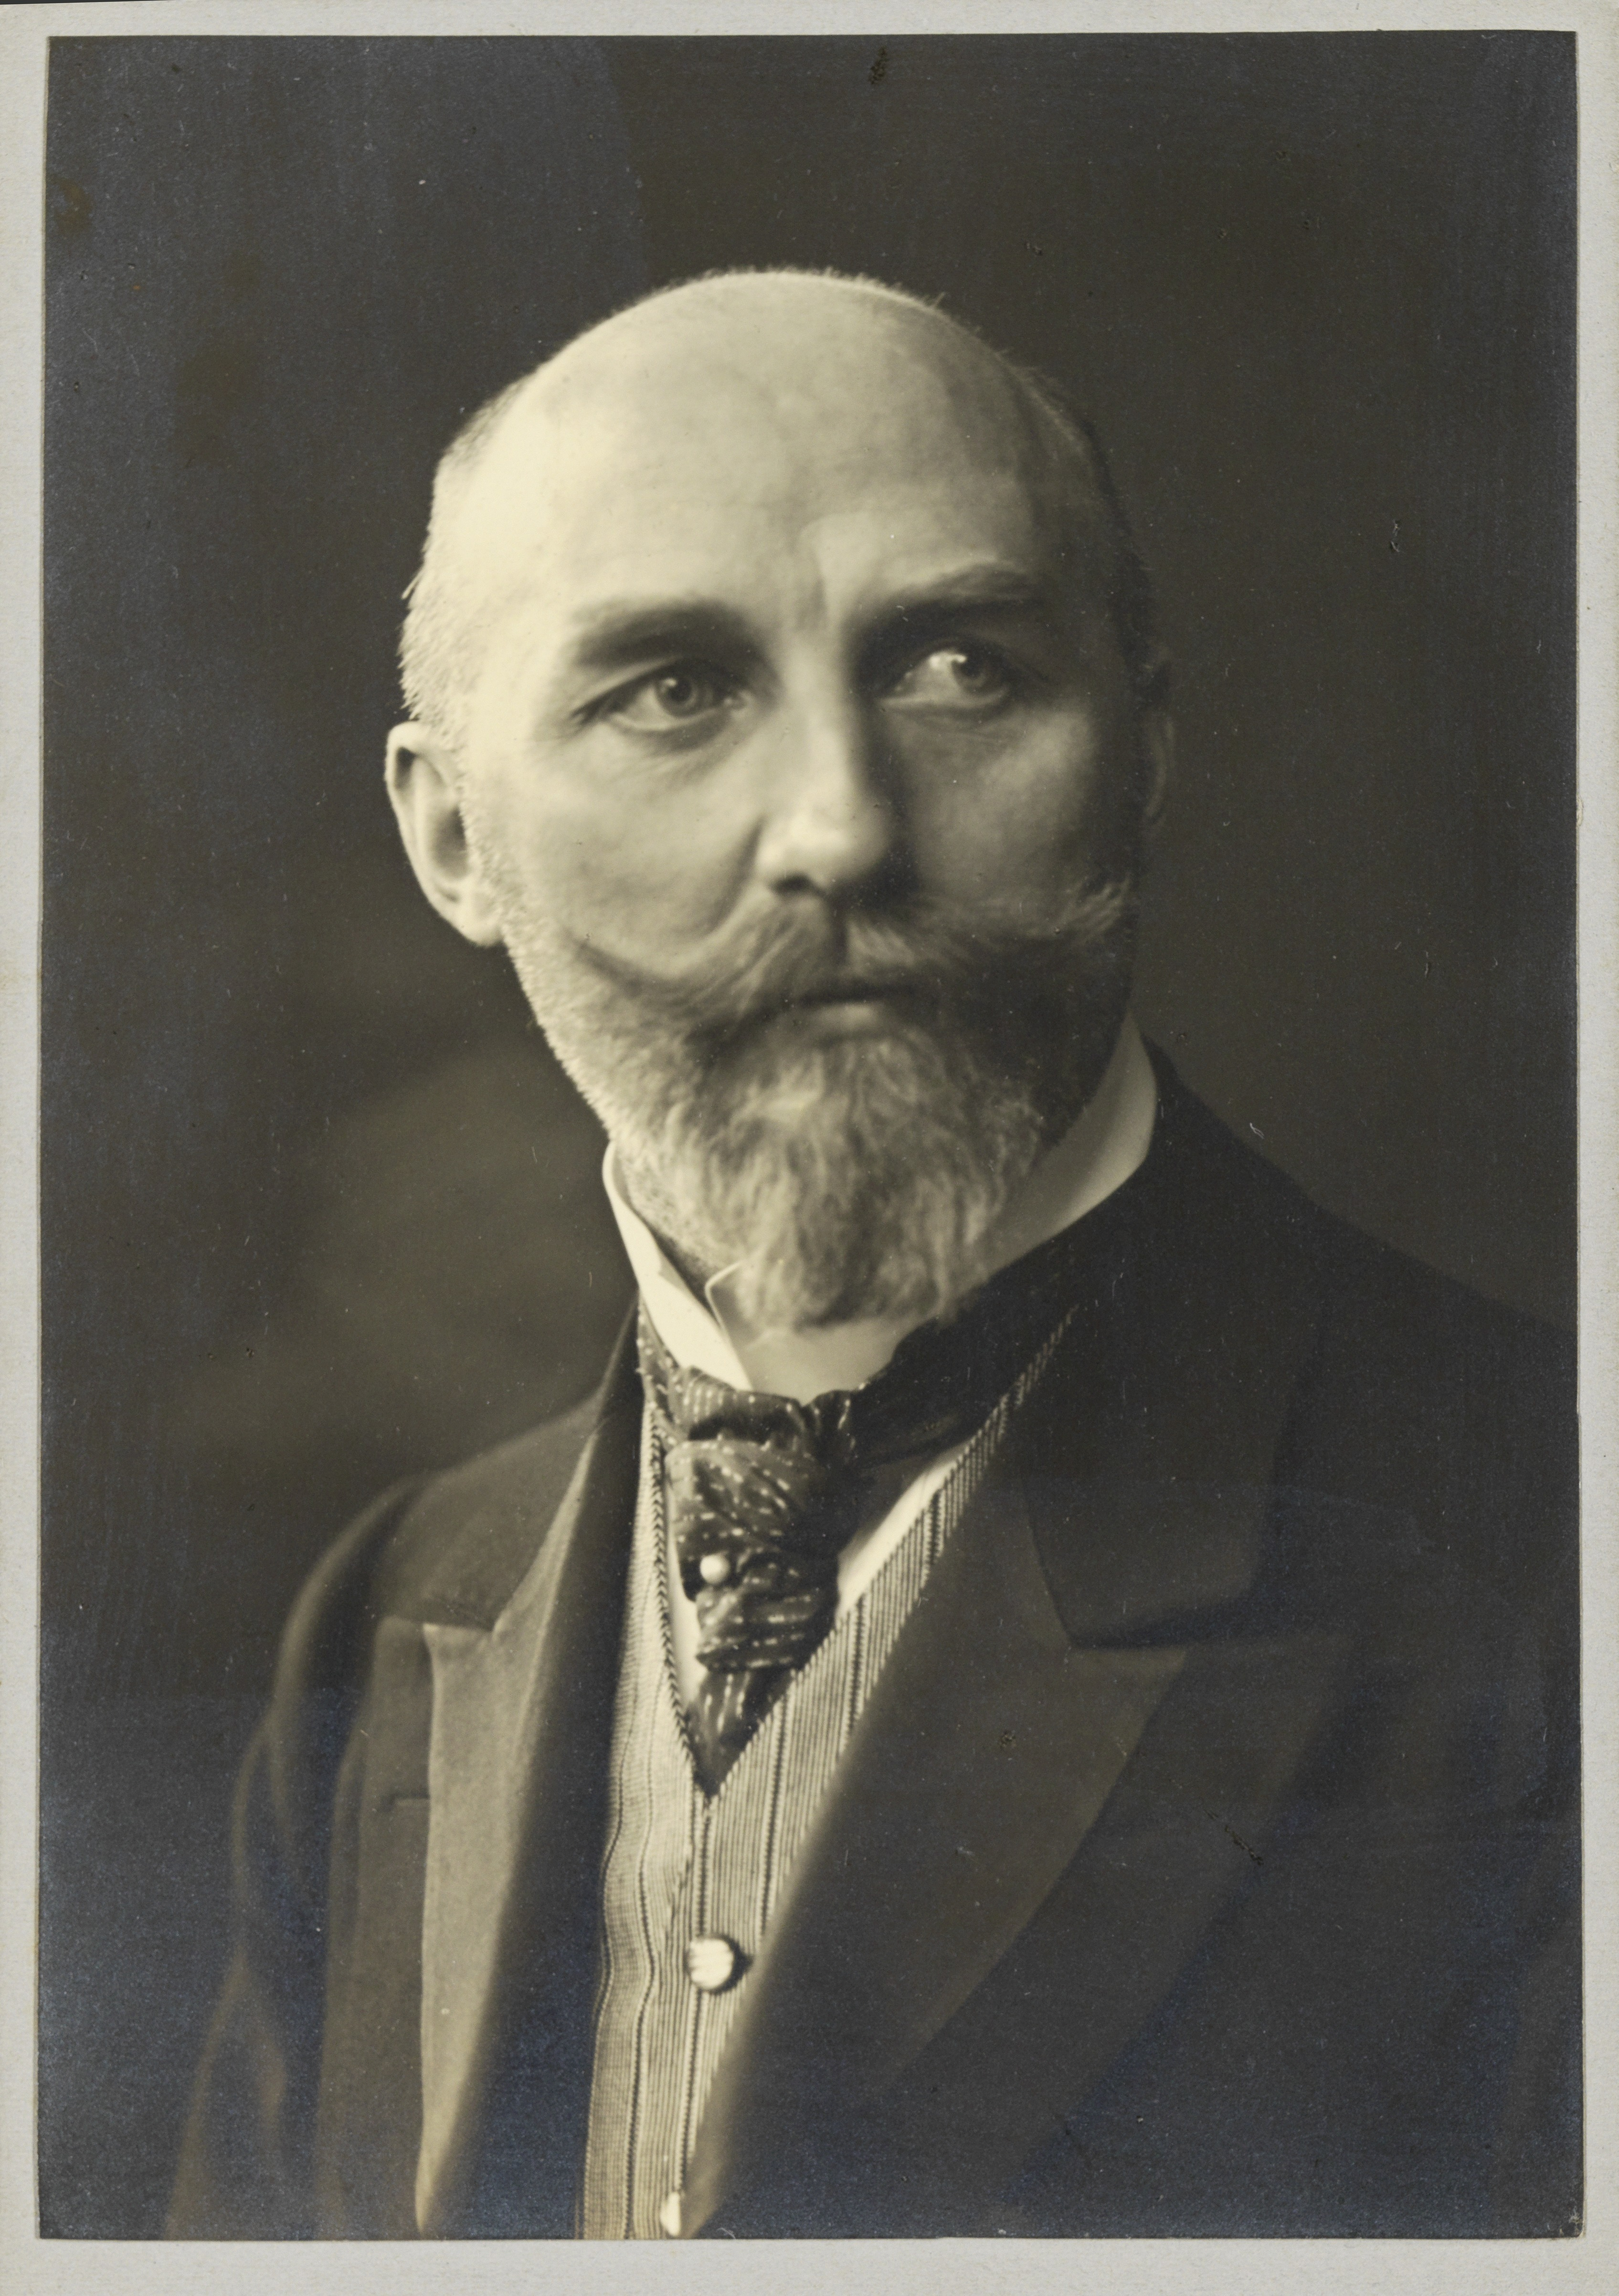 Image of Hermann Jansen from Wikidata